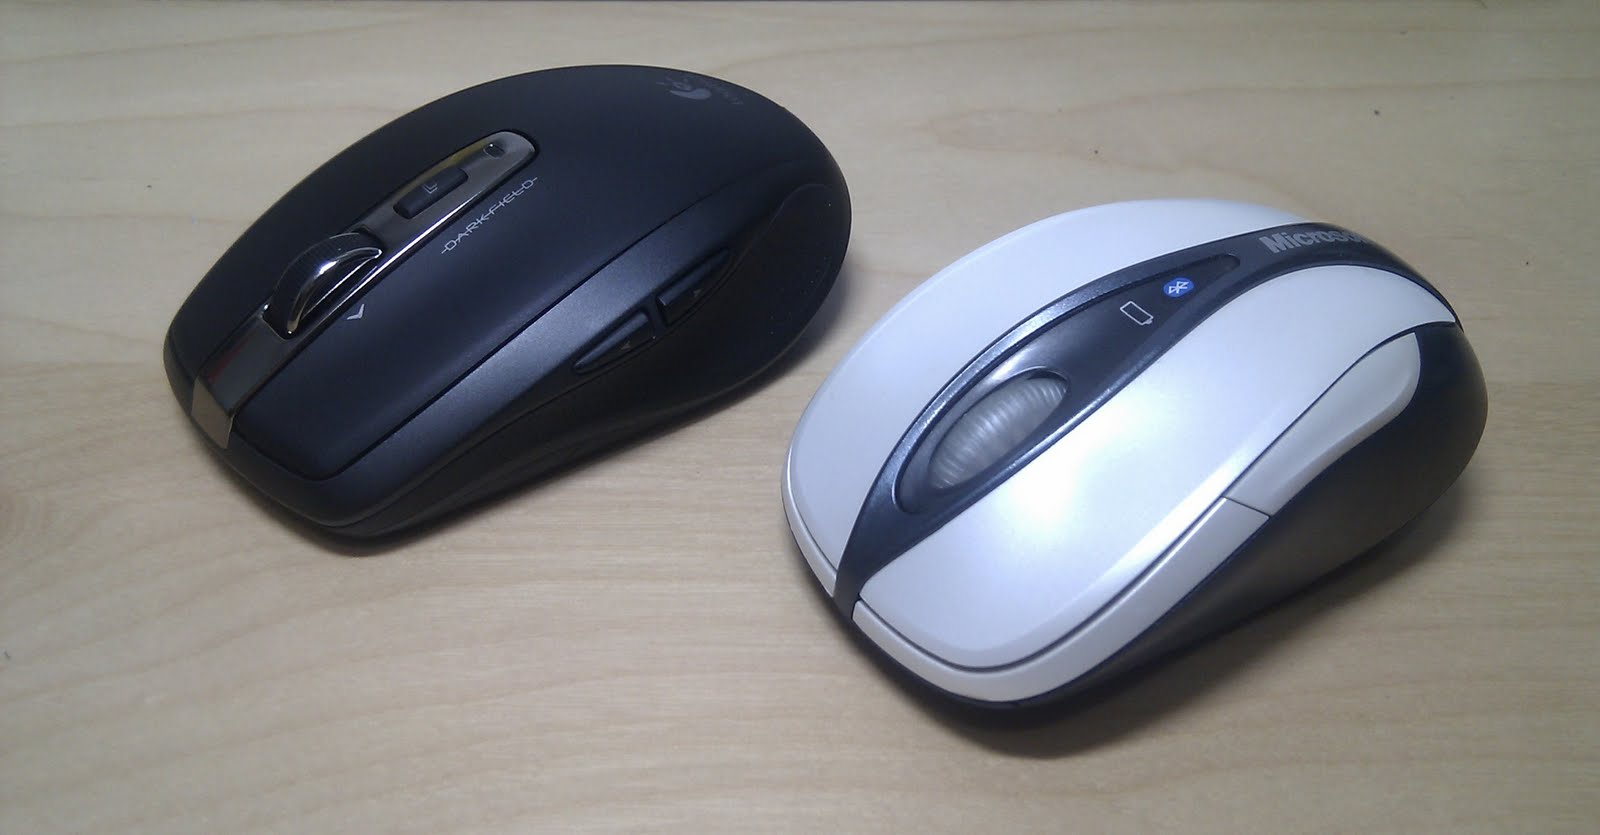 Joe Ten: Logitech Anywhere Mouse MX vs Microsoft Notebook Bluetooth